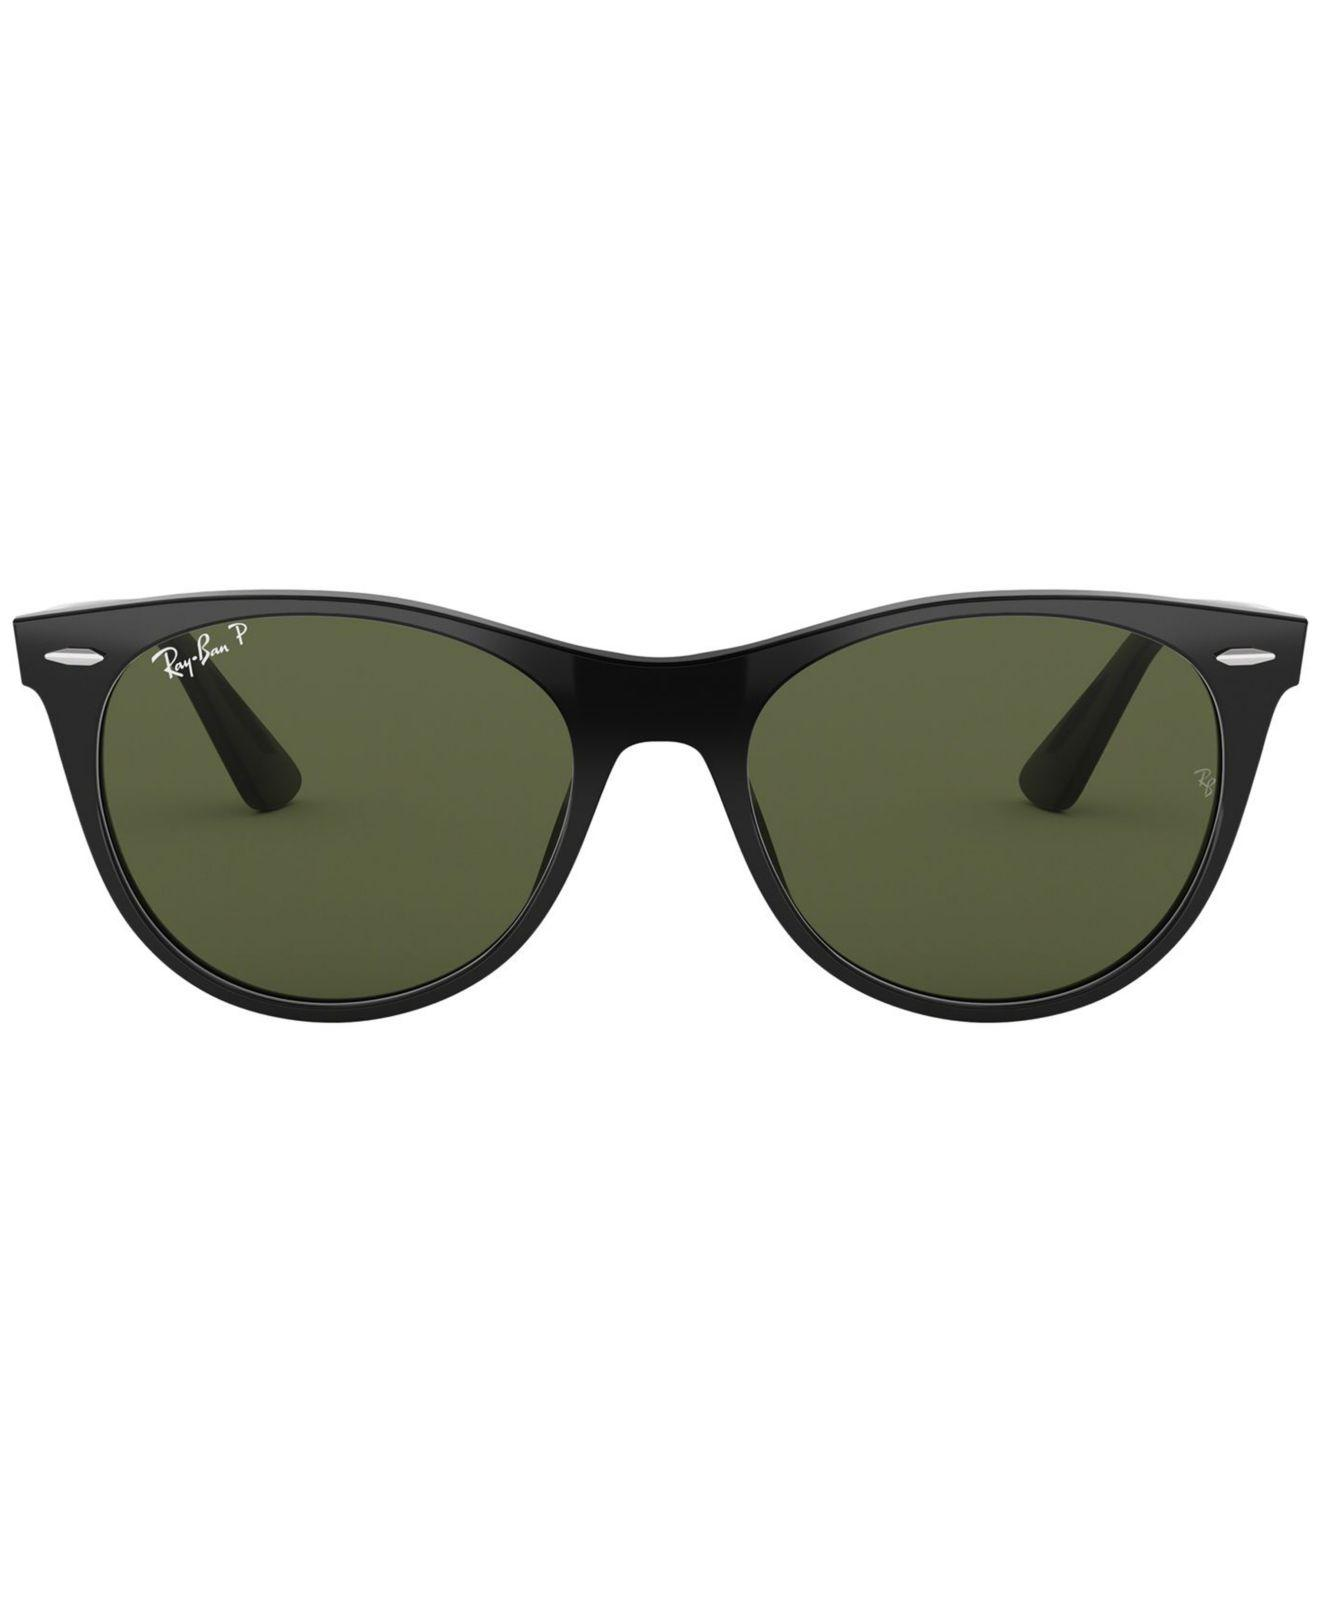 a8004d210a Lyst - Ray-Ban Polarized Sunglasses